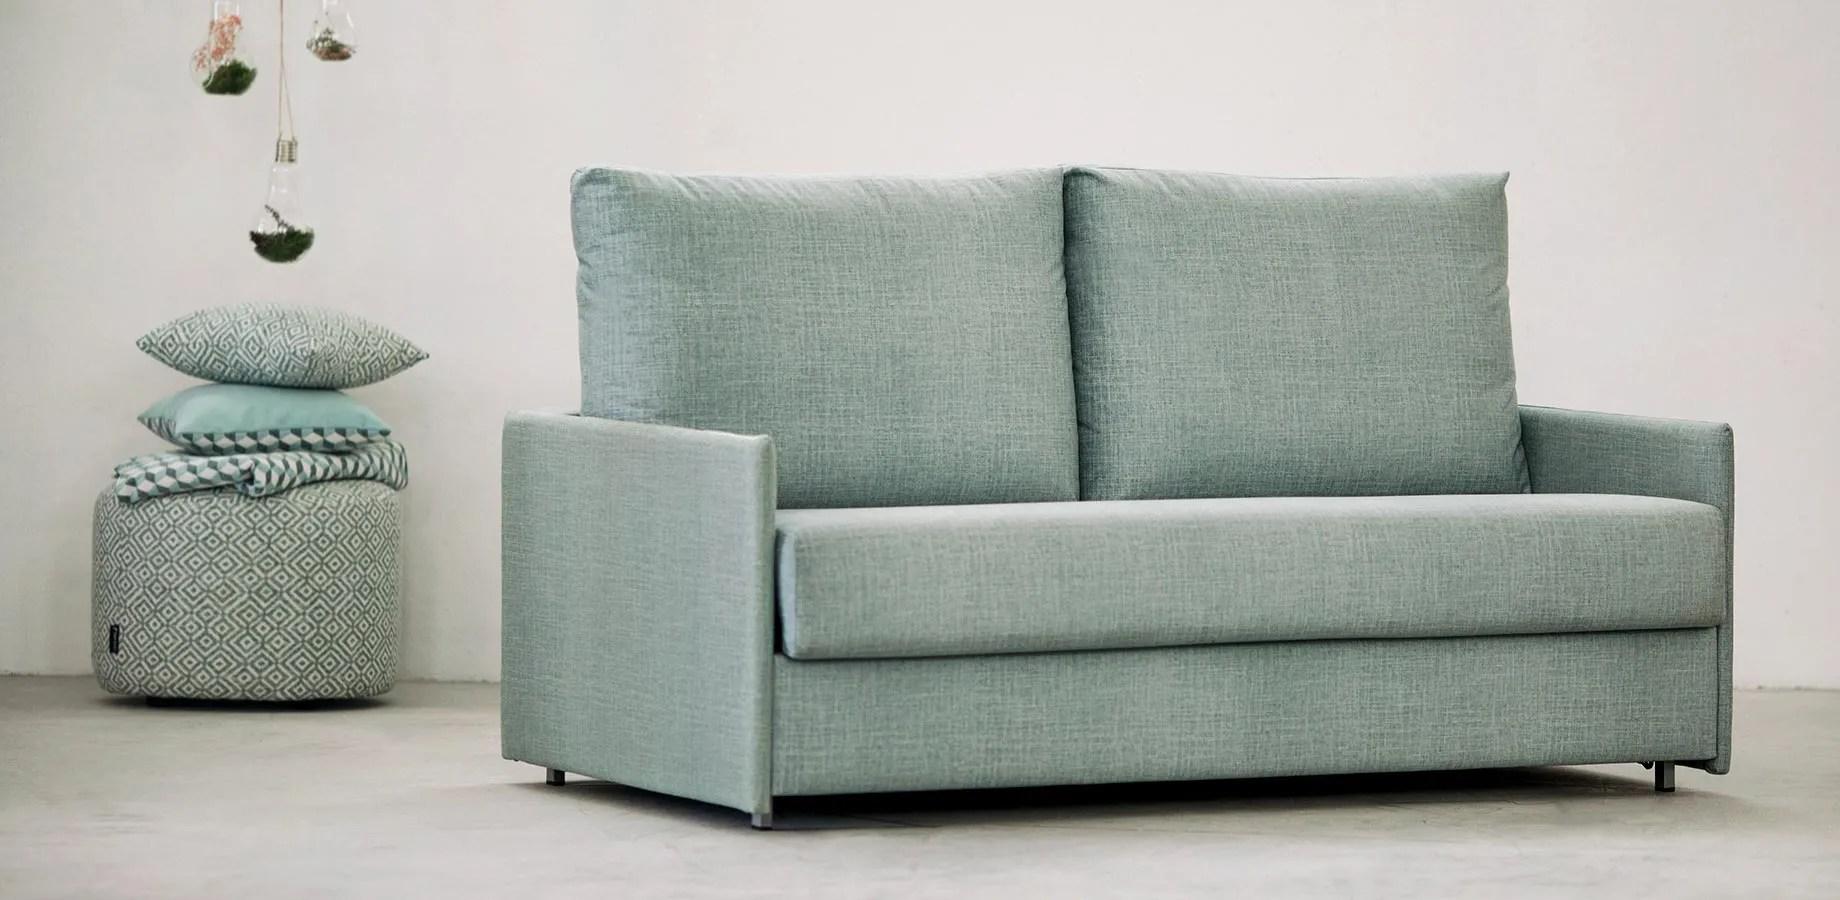 cama sofa forja sofaworks toy italiano caramelo mueblescarisma es